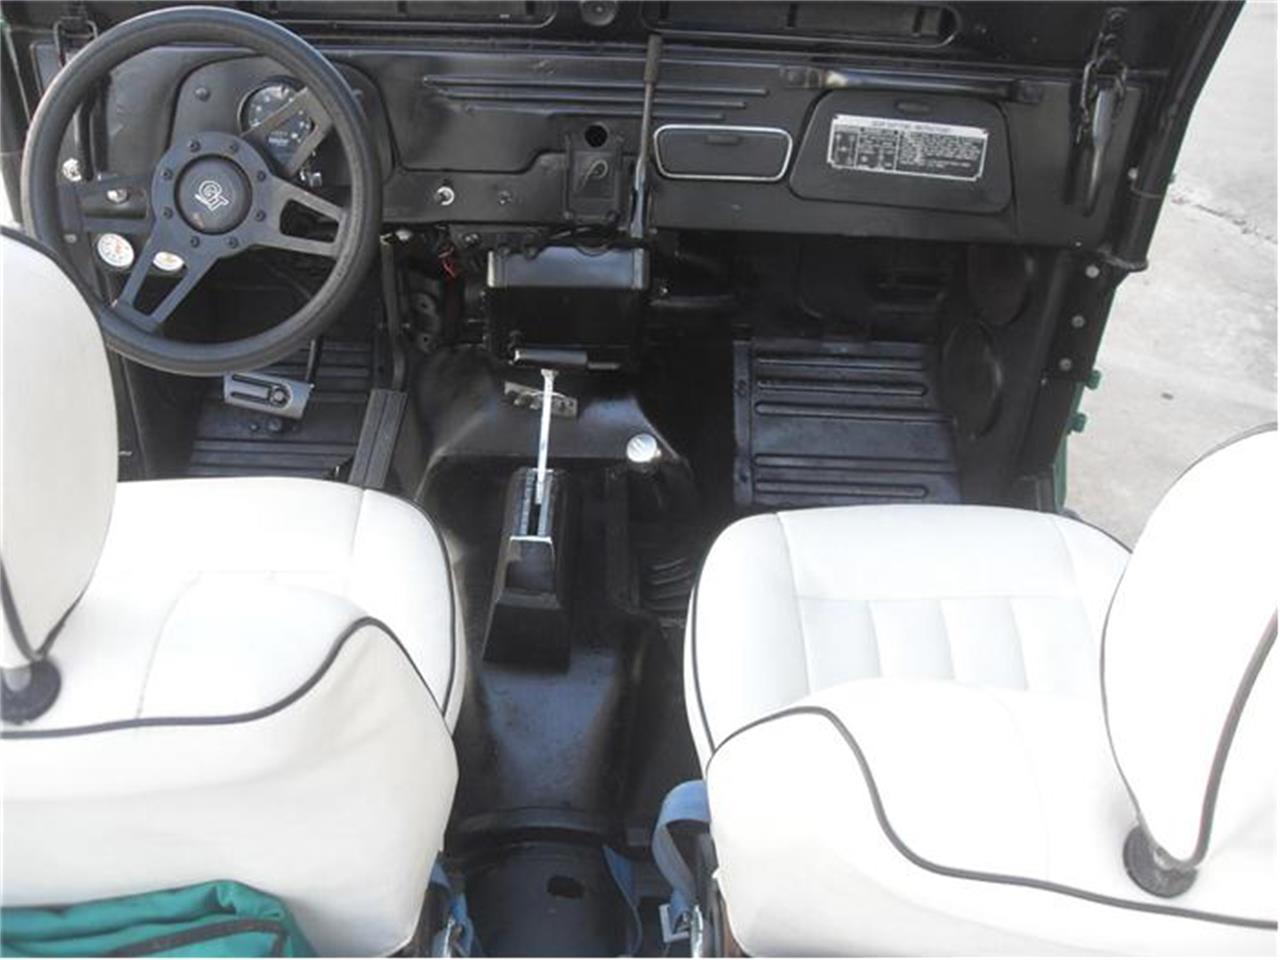 Large Picture of '65 Toyota FJ Cruiser located in Conroe Texas - $24,500.00 - 64WA